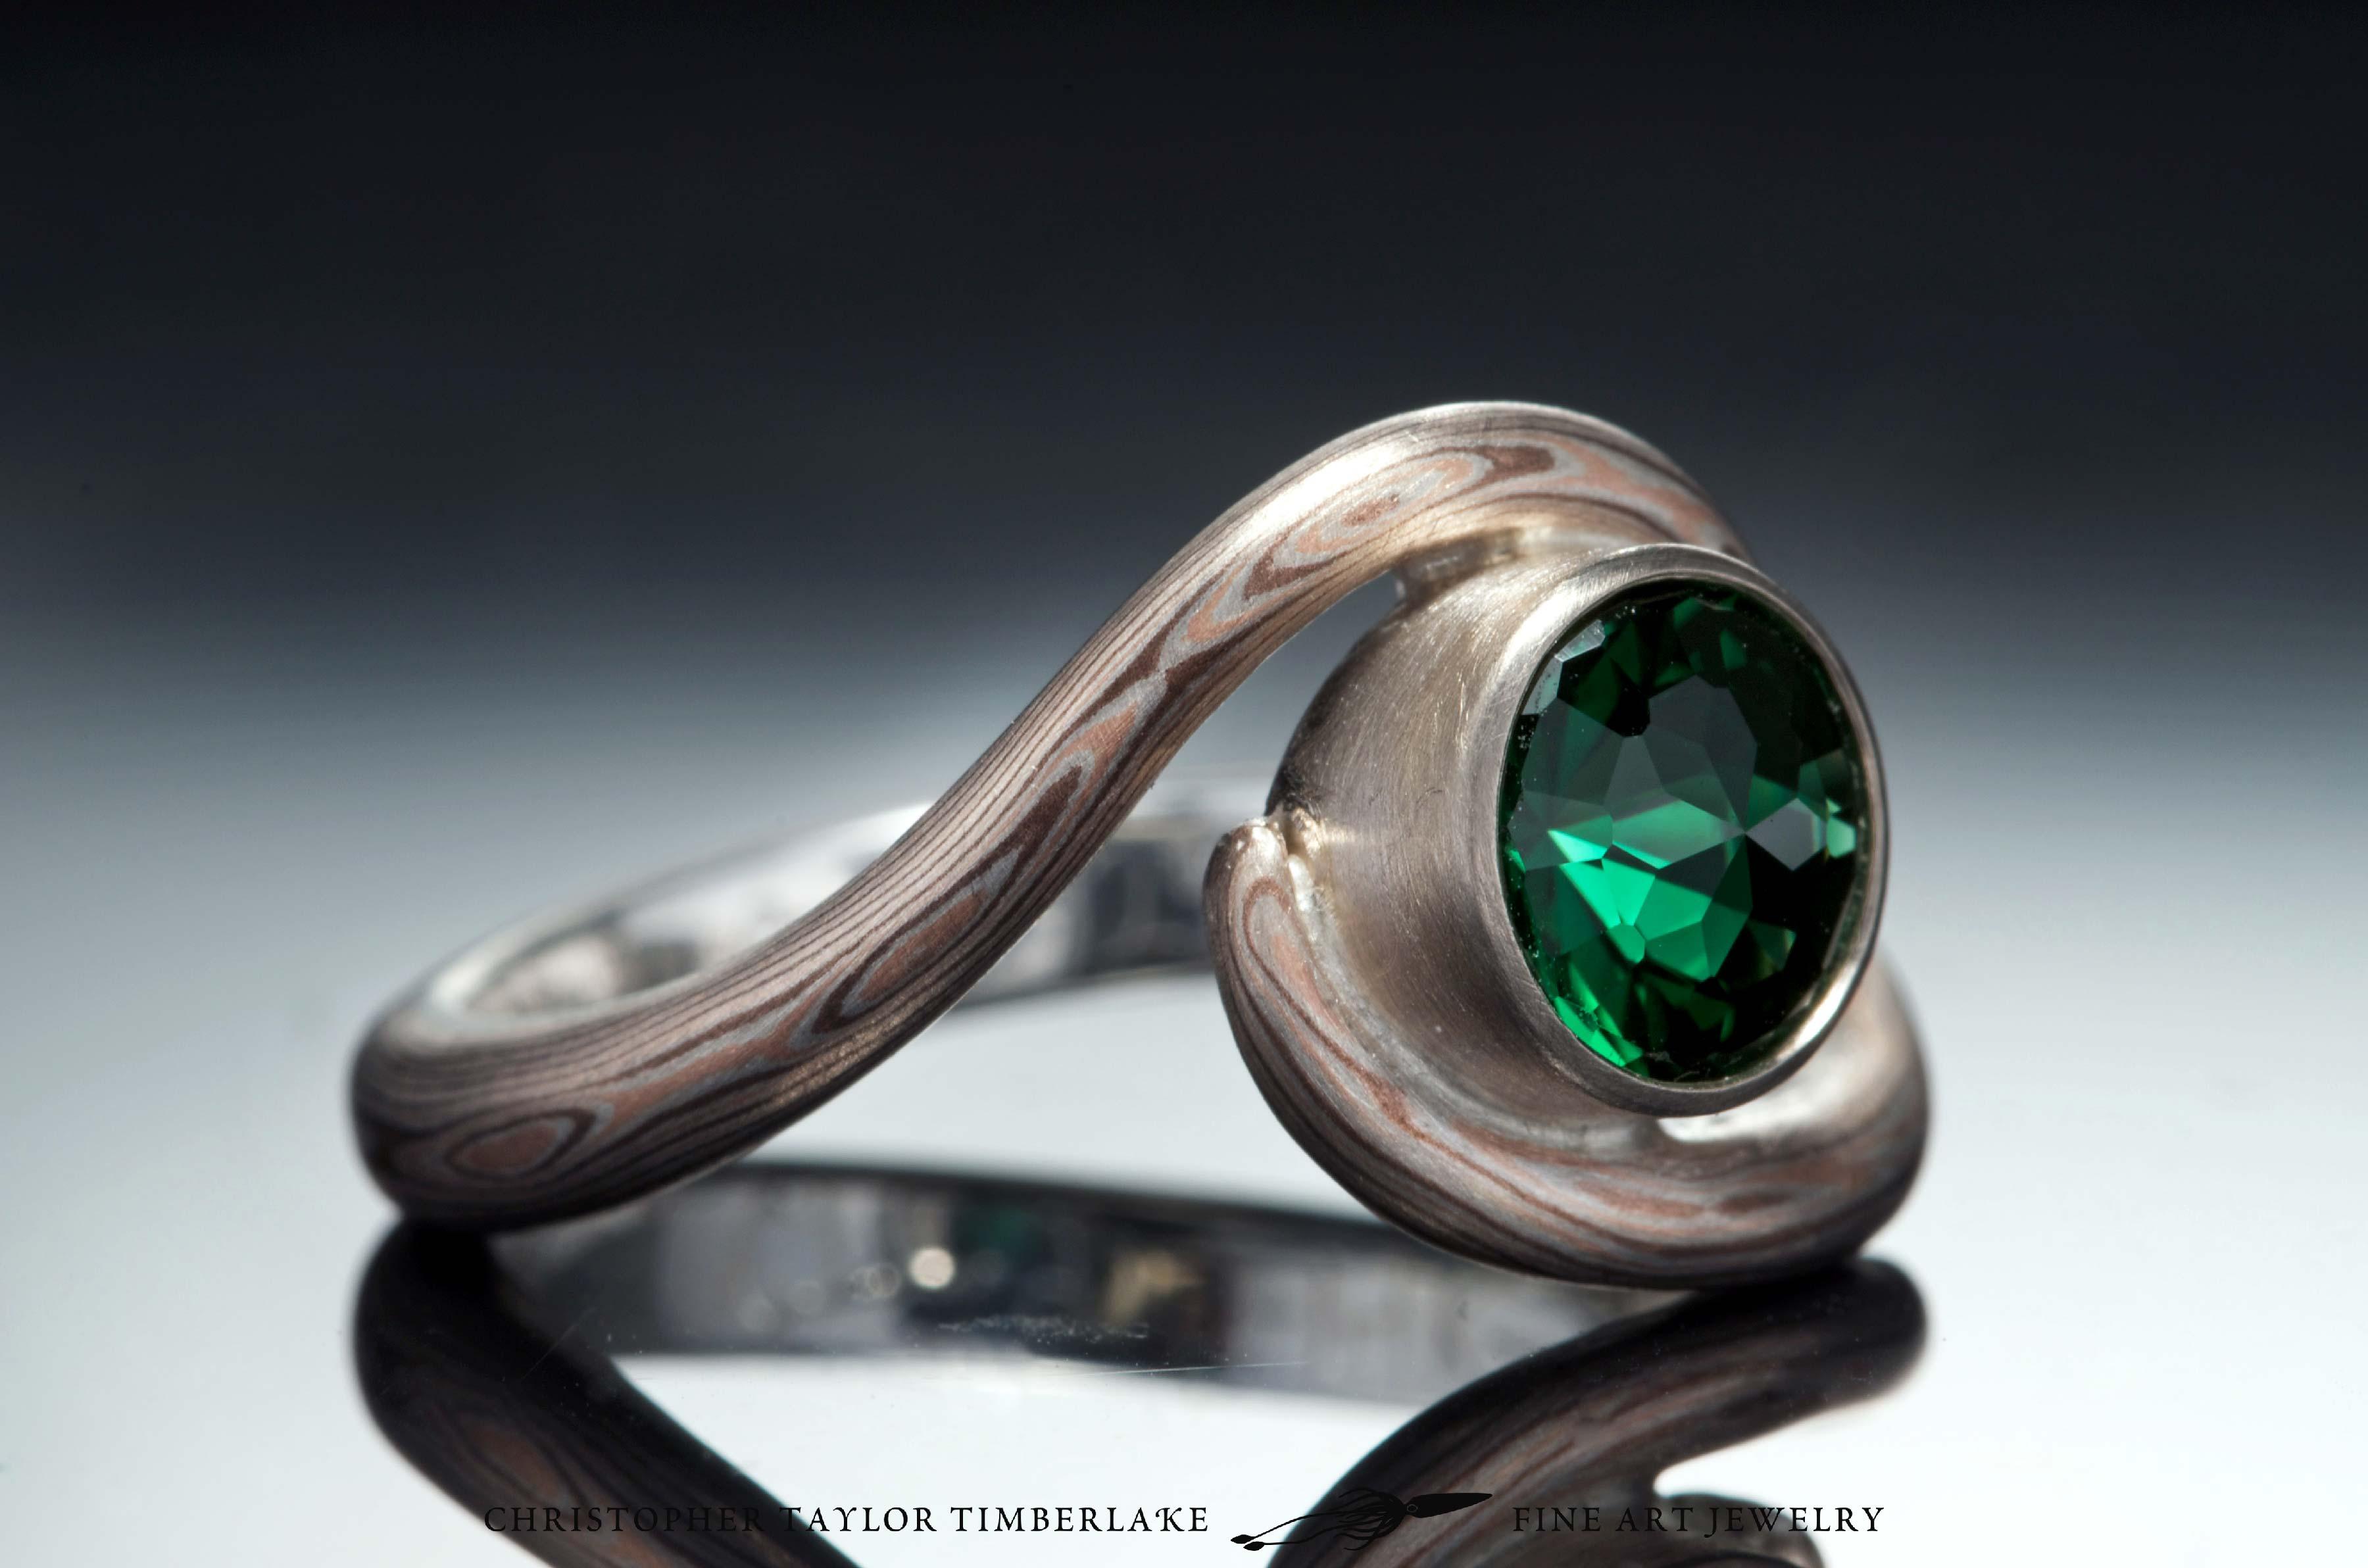 Mokume-(m81)-14-Karat-rose-gold,-shakudo-(2K),-and-sterling-silver-with-Palladium-and-6,31mm-modified-rose-cut-round-chrome-green-tourmaline-2